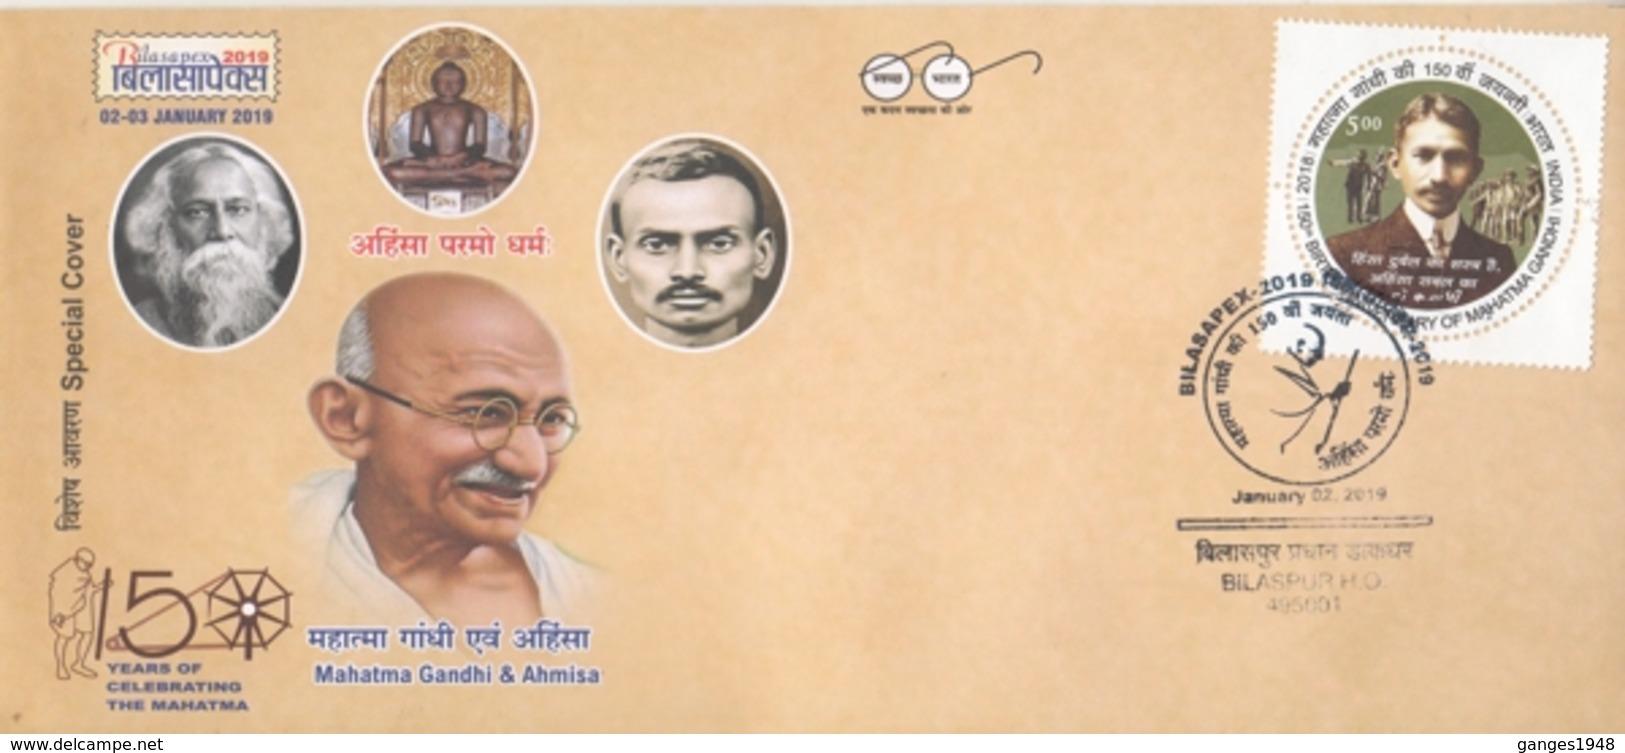 INDIA  2019  Mahatma Gandhi & Ahims  Jainism Idol  Rabindranath Tagore Special Cover  # 20717    D Inde  Indien - Mahatma Gandhi